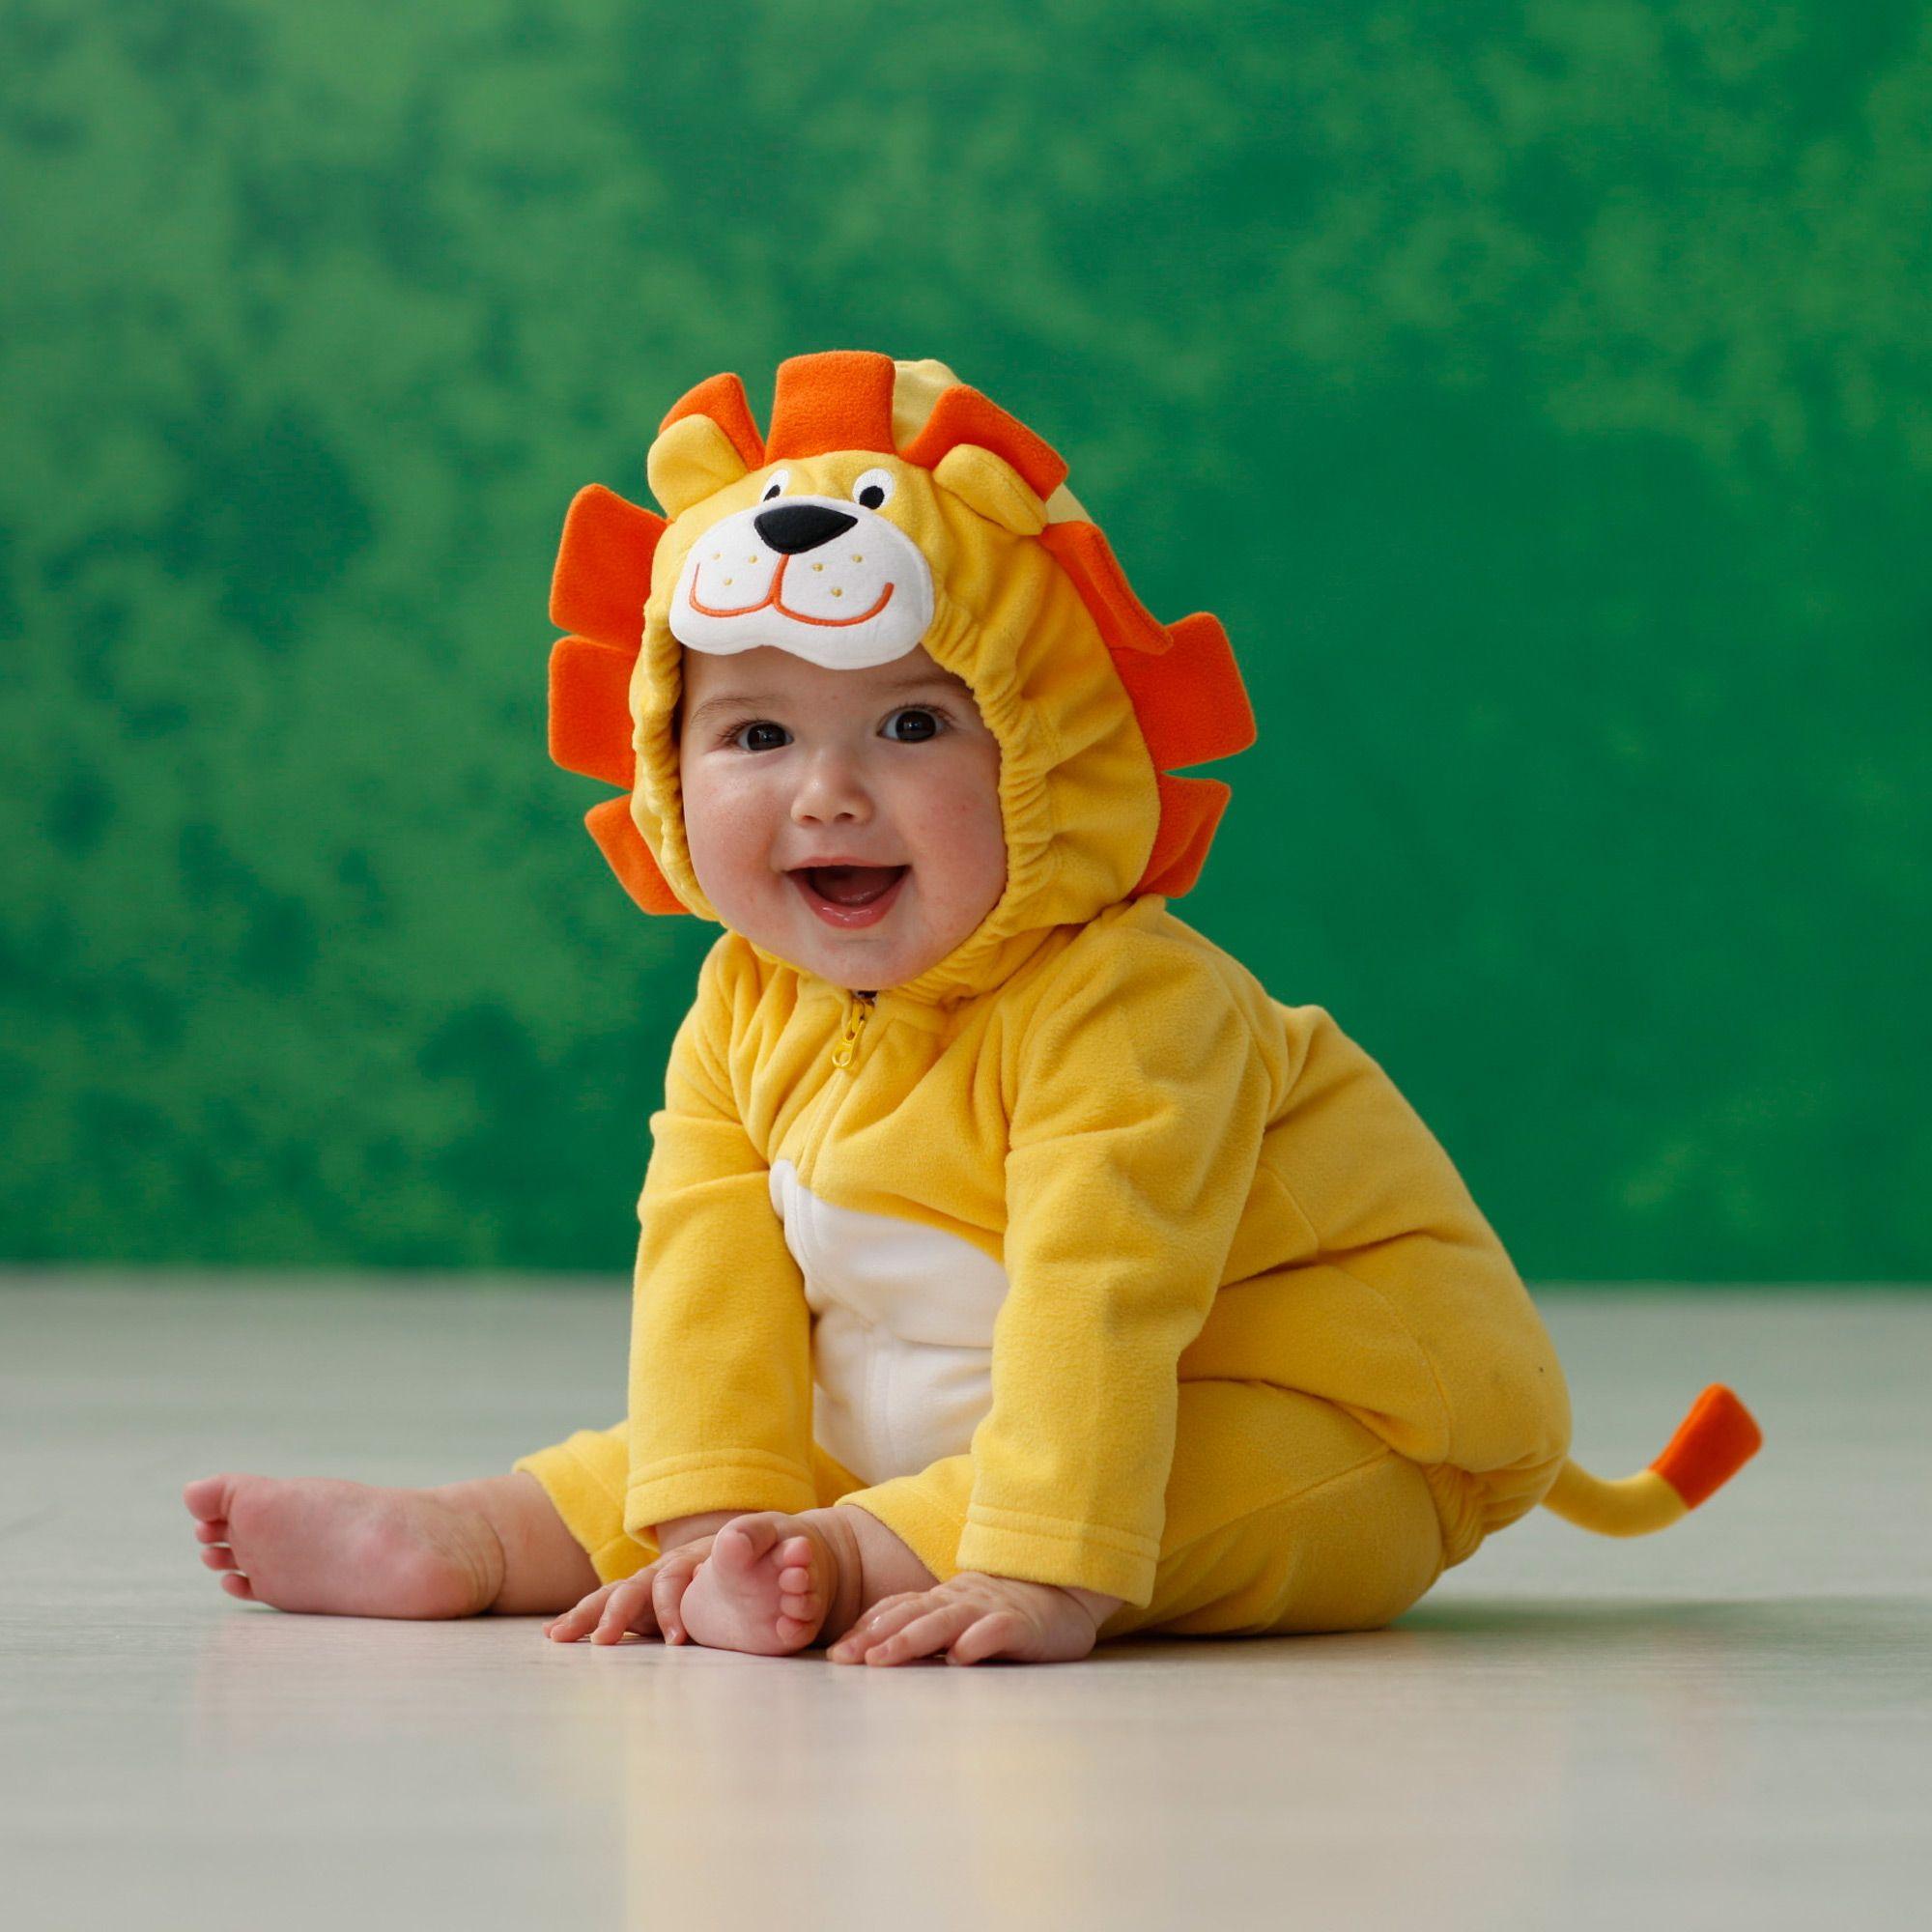 Lion Halloween Costume | Baby Boy Halloween Shop  sc 1 st  Pinterest & Lion Halloween Costume | Baby Boy Halloween Shop | Halloween... Boo ...